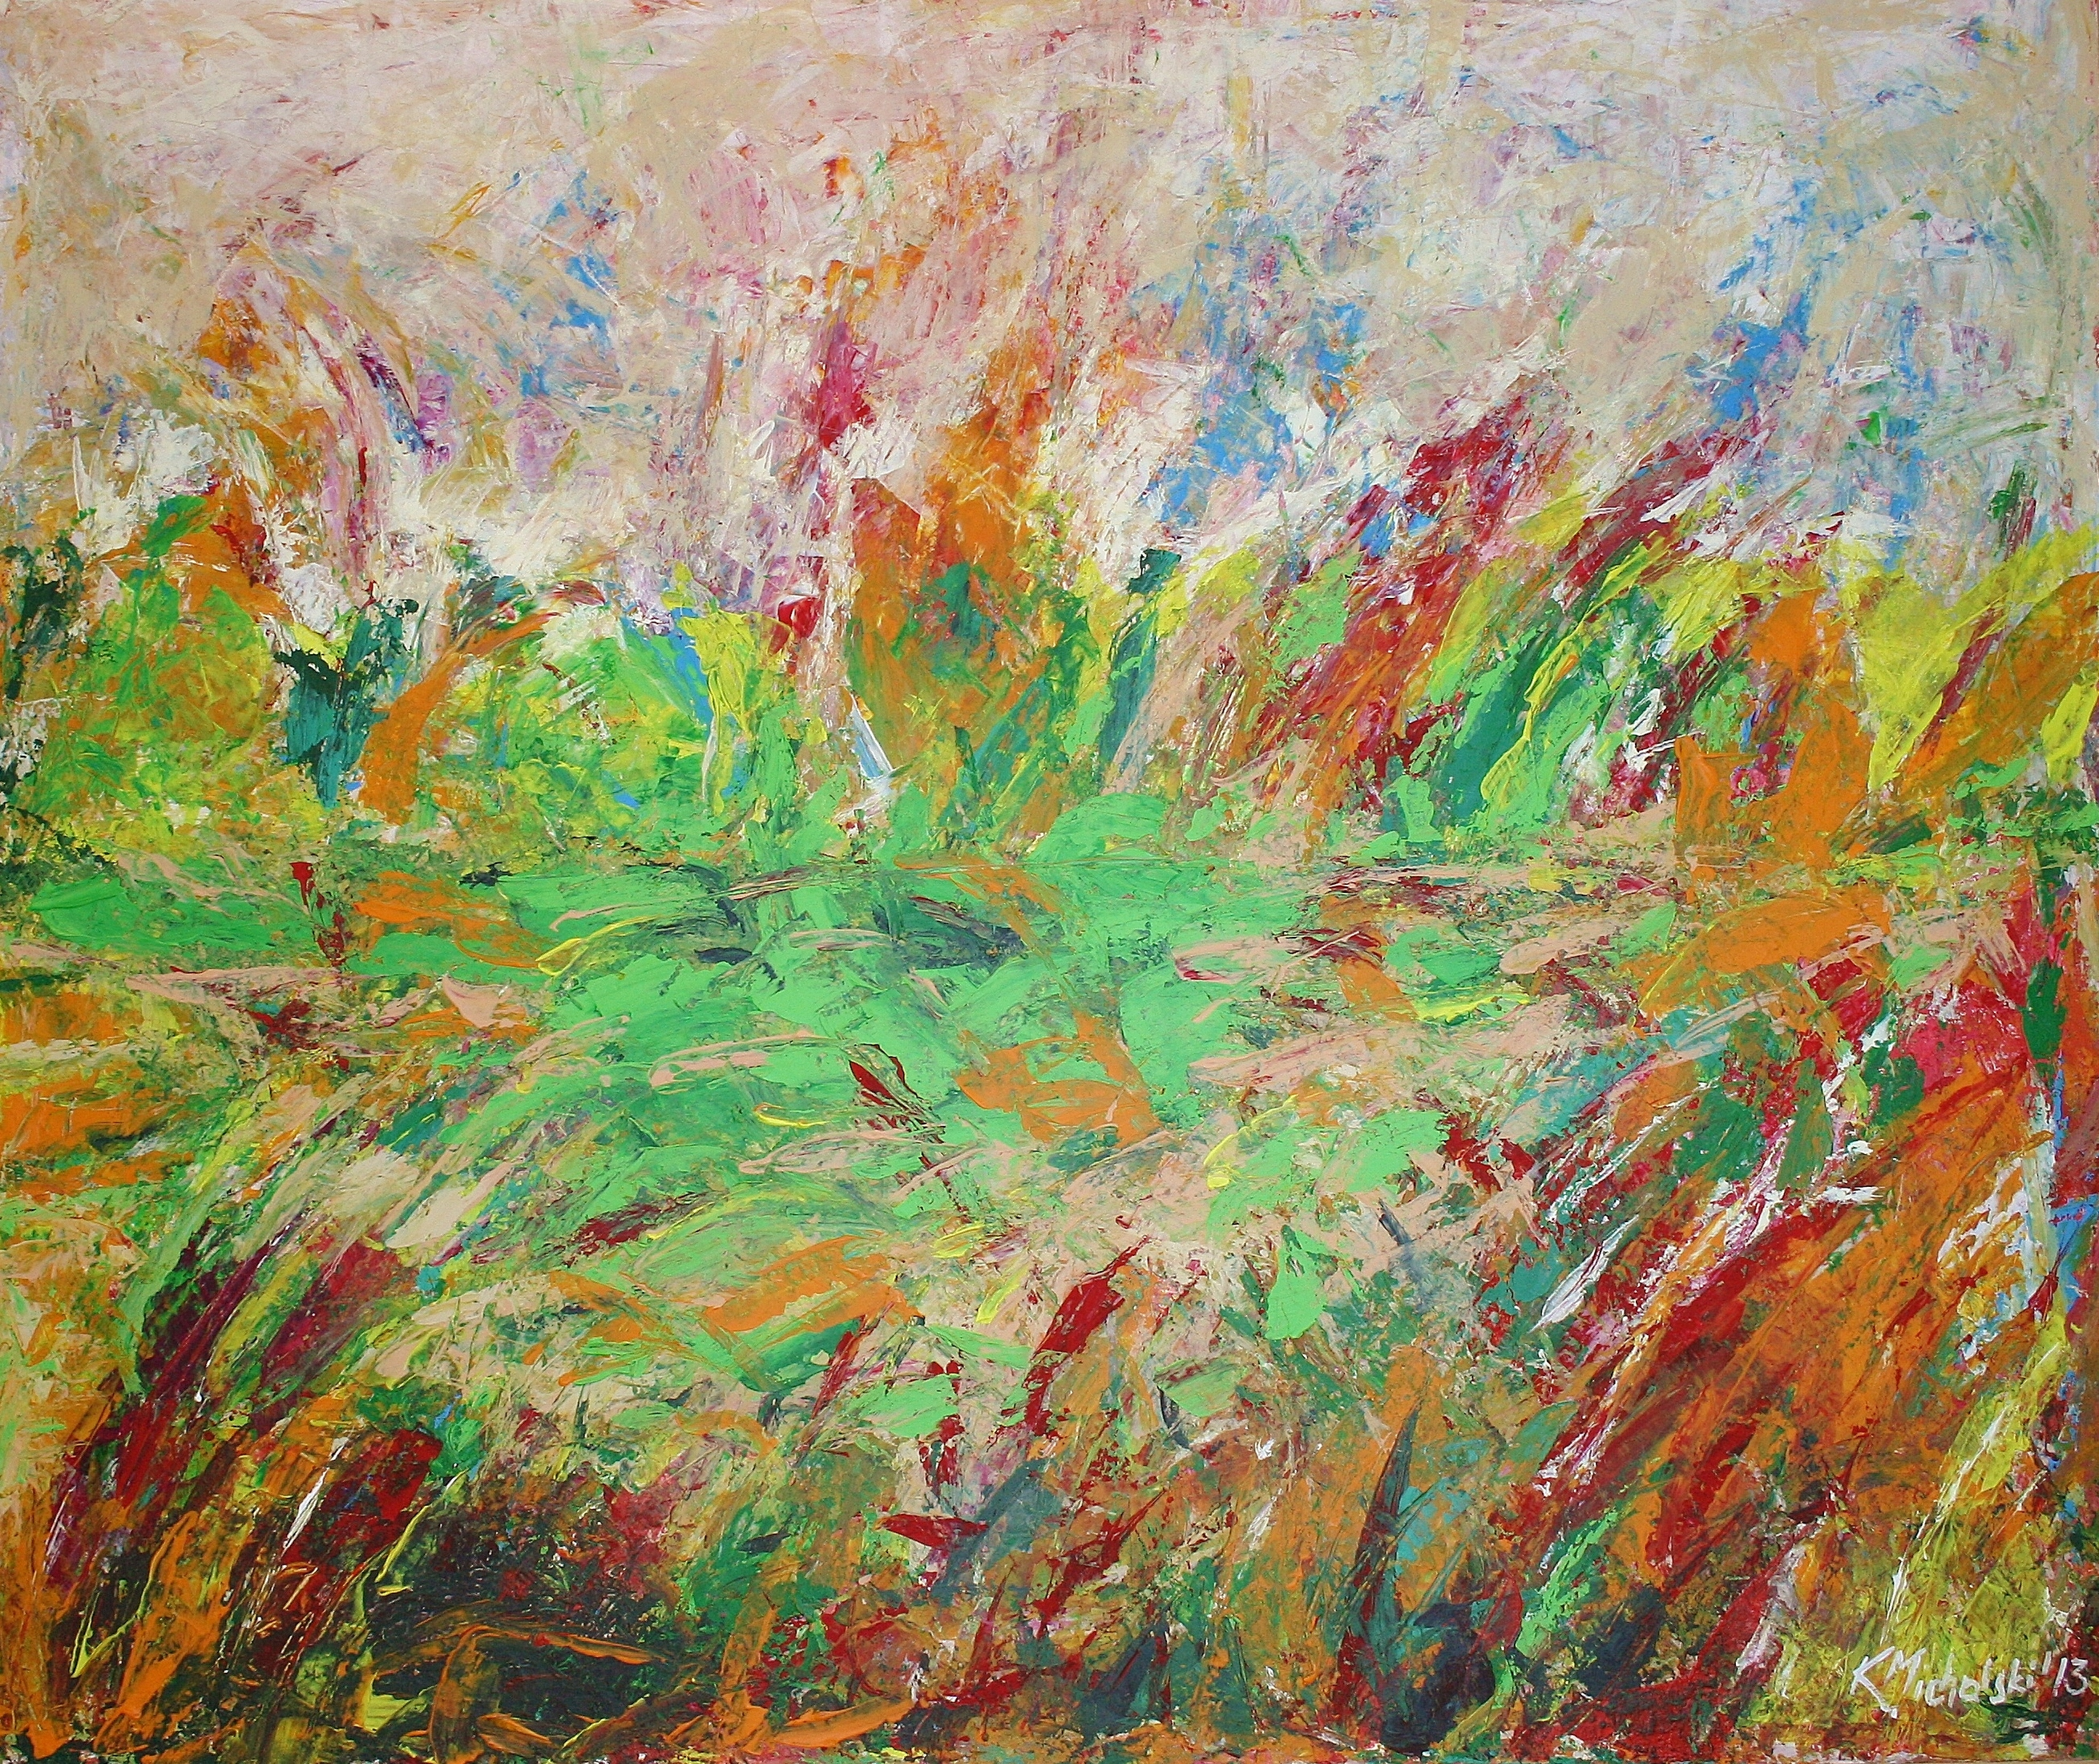 Sommer grün, 2013, 100 x 120, Acryl auf Leinwand